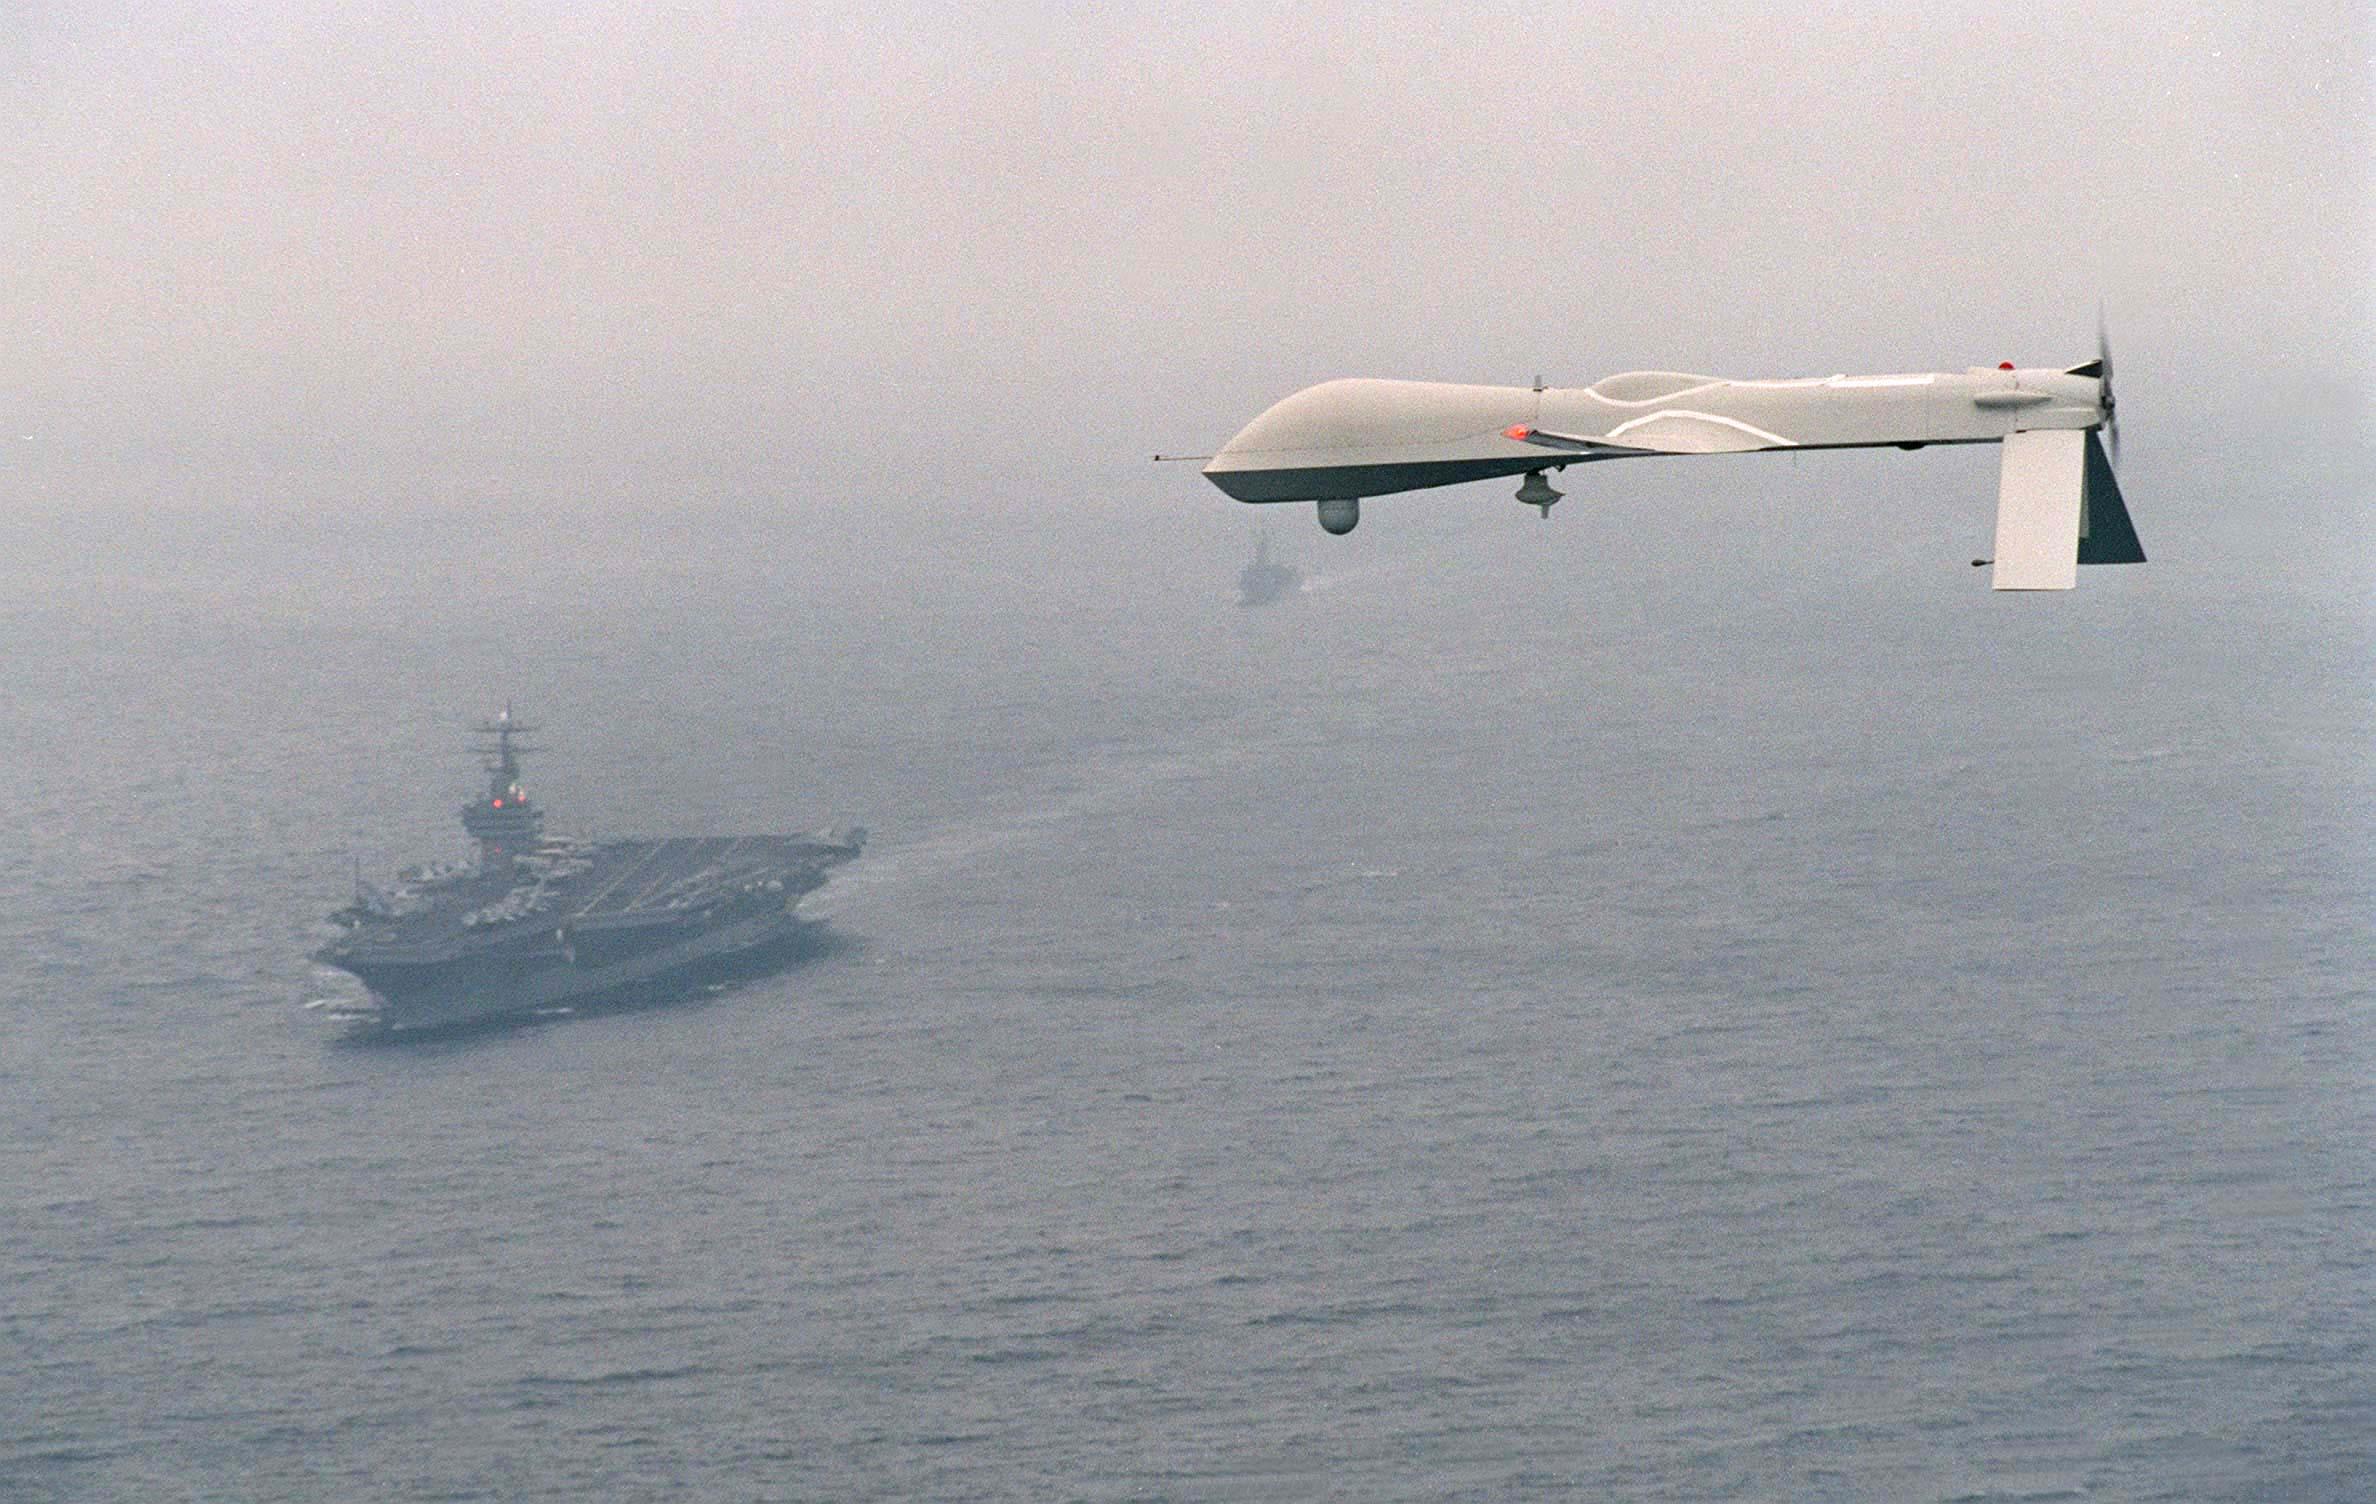 Predator UAV flies above the aircraft carrier USS Carl Vinson (CVN 70) on  Dec. 5, 1995.